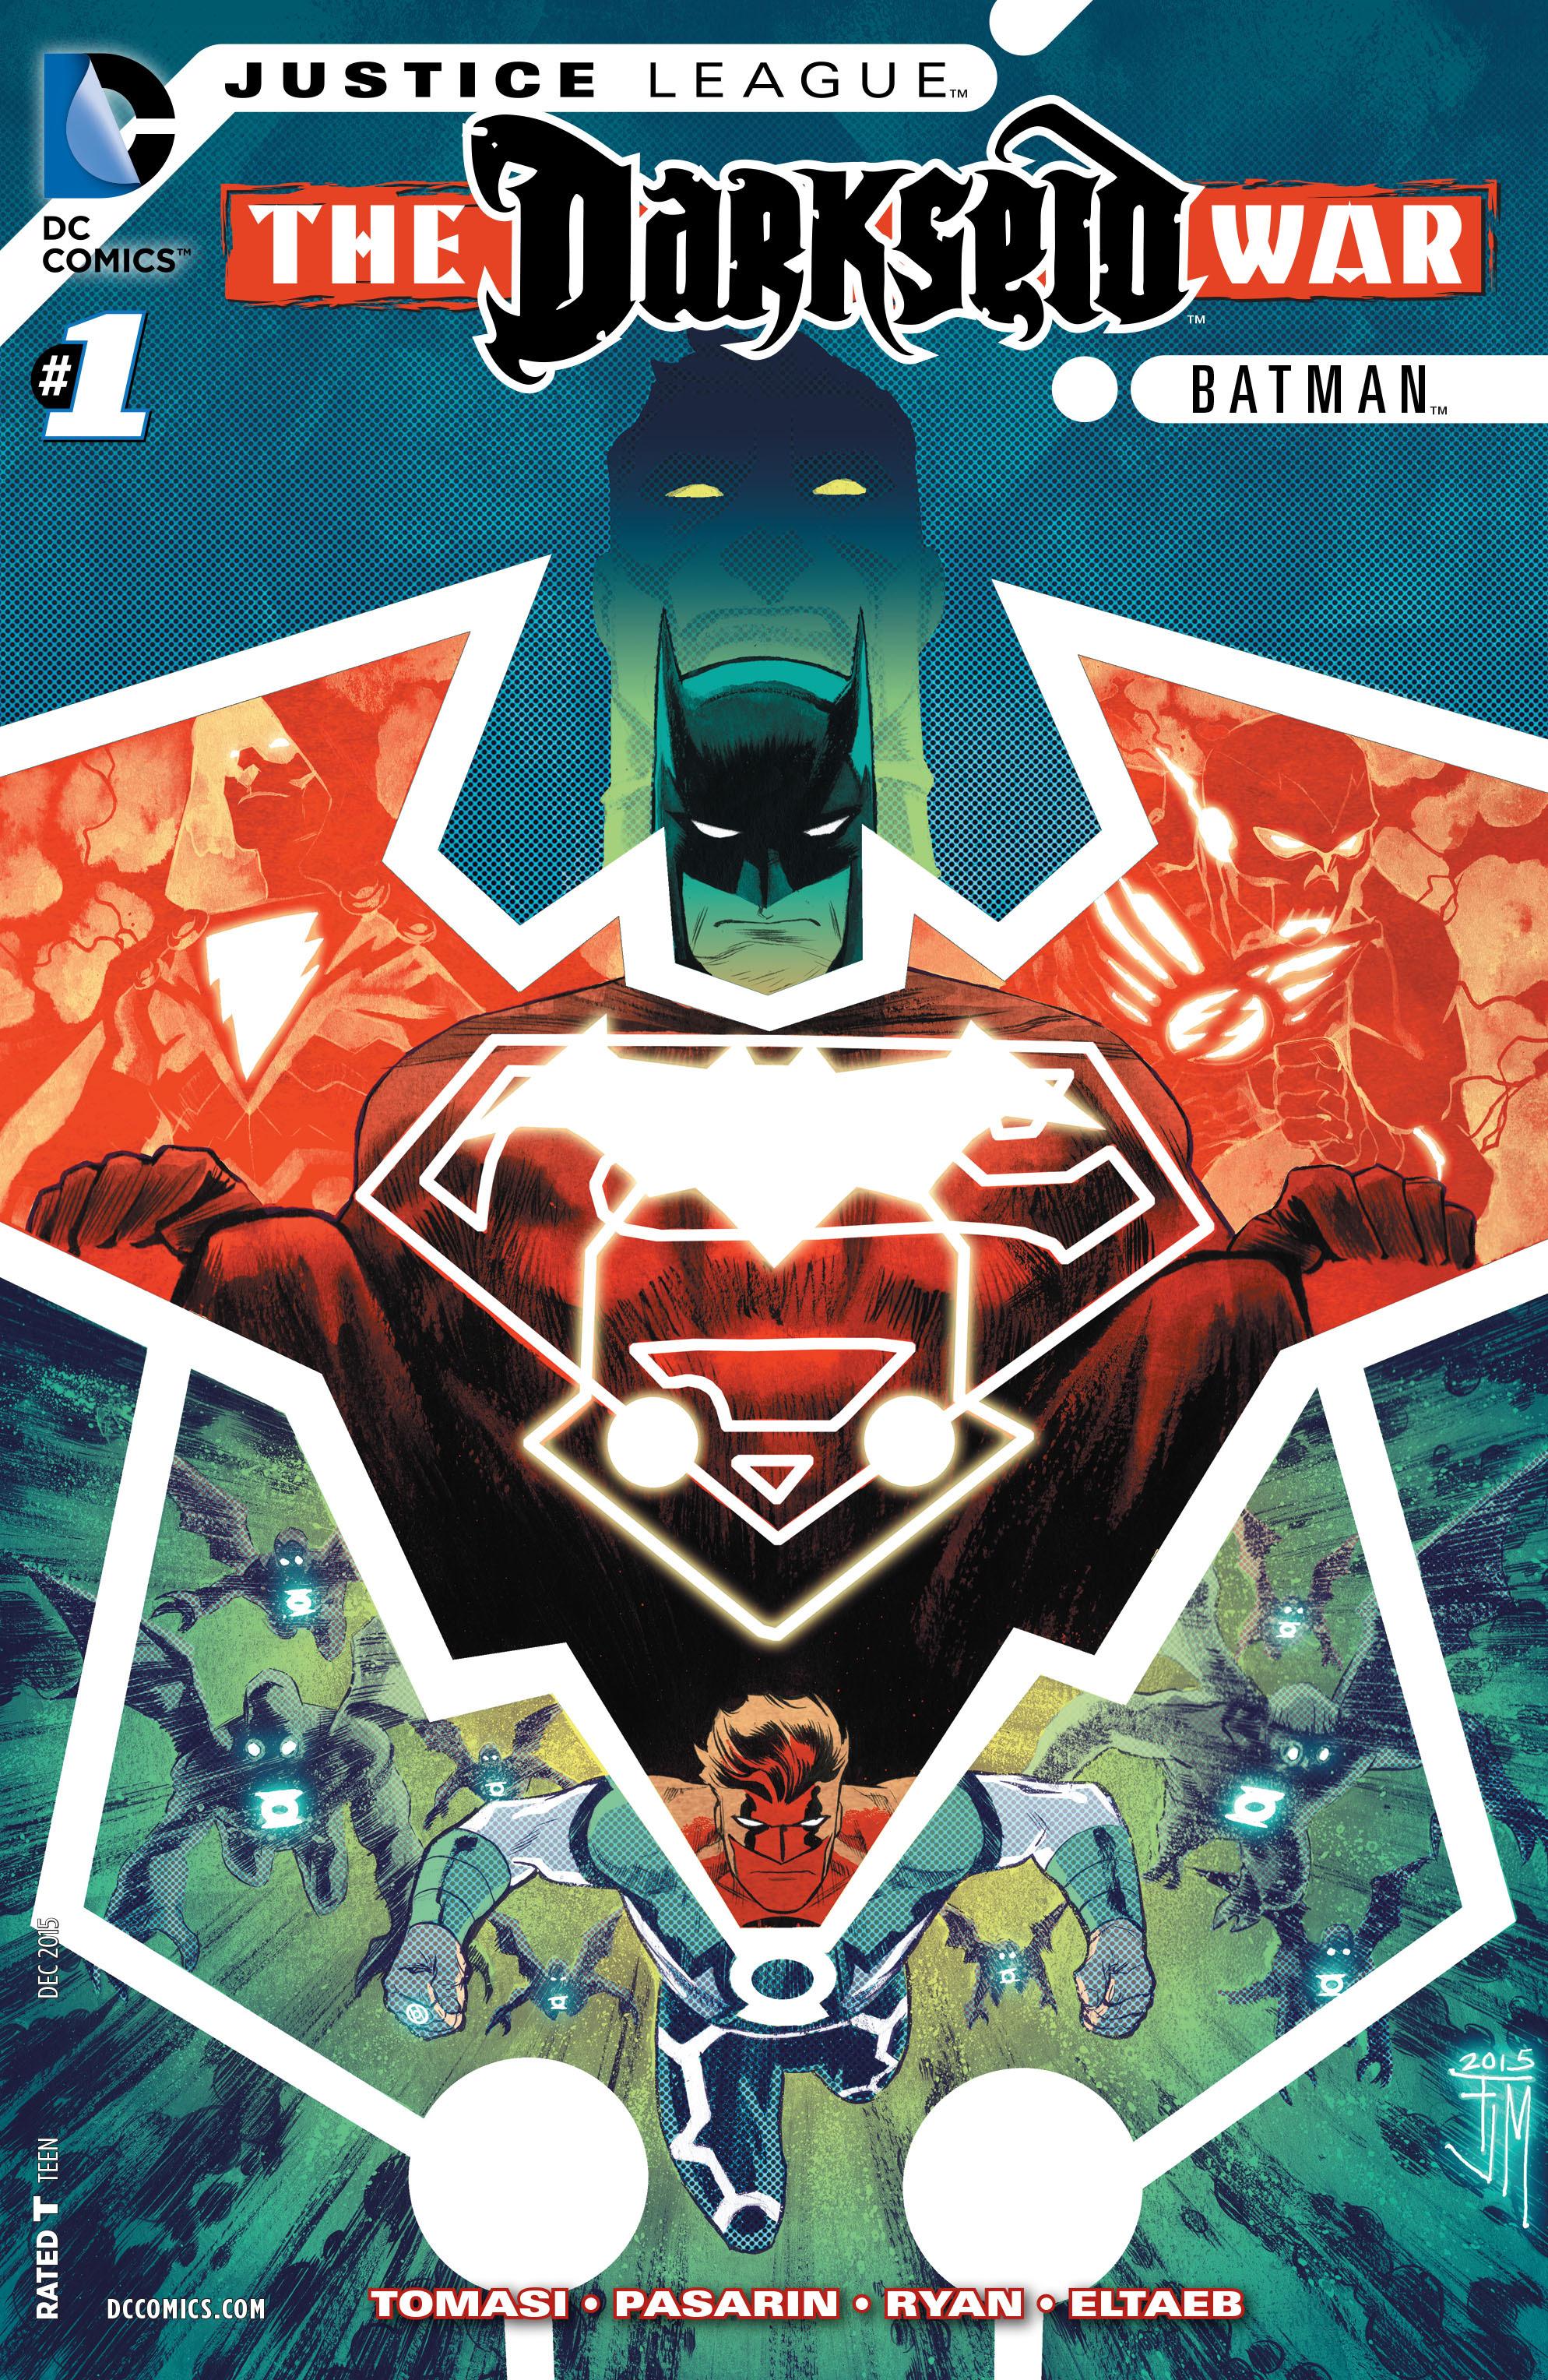 Justice League: Darkseid War: Batman 1 Page 1